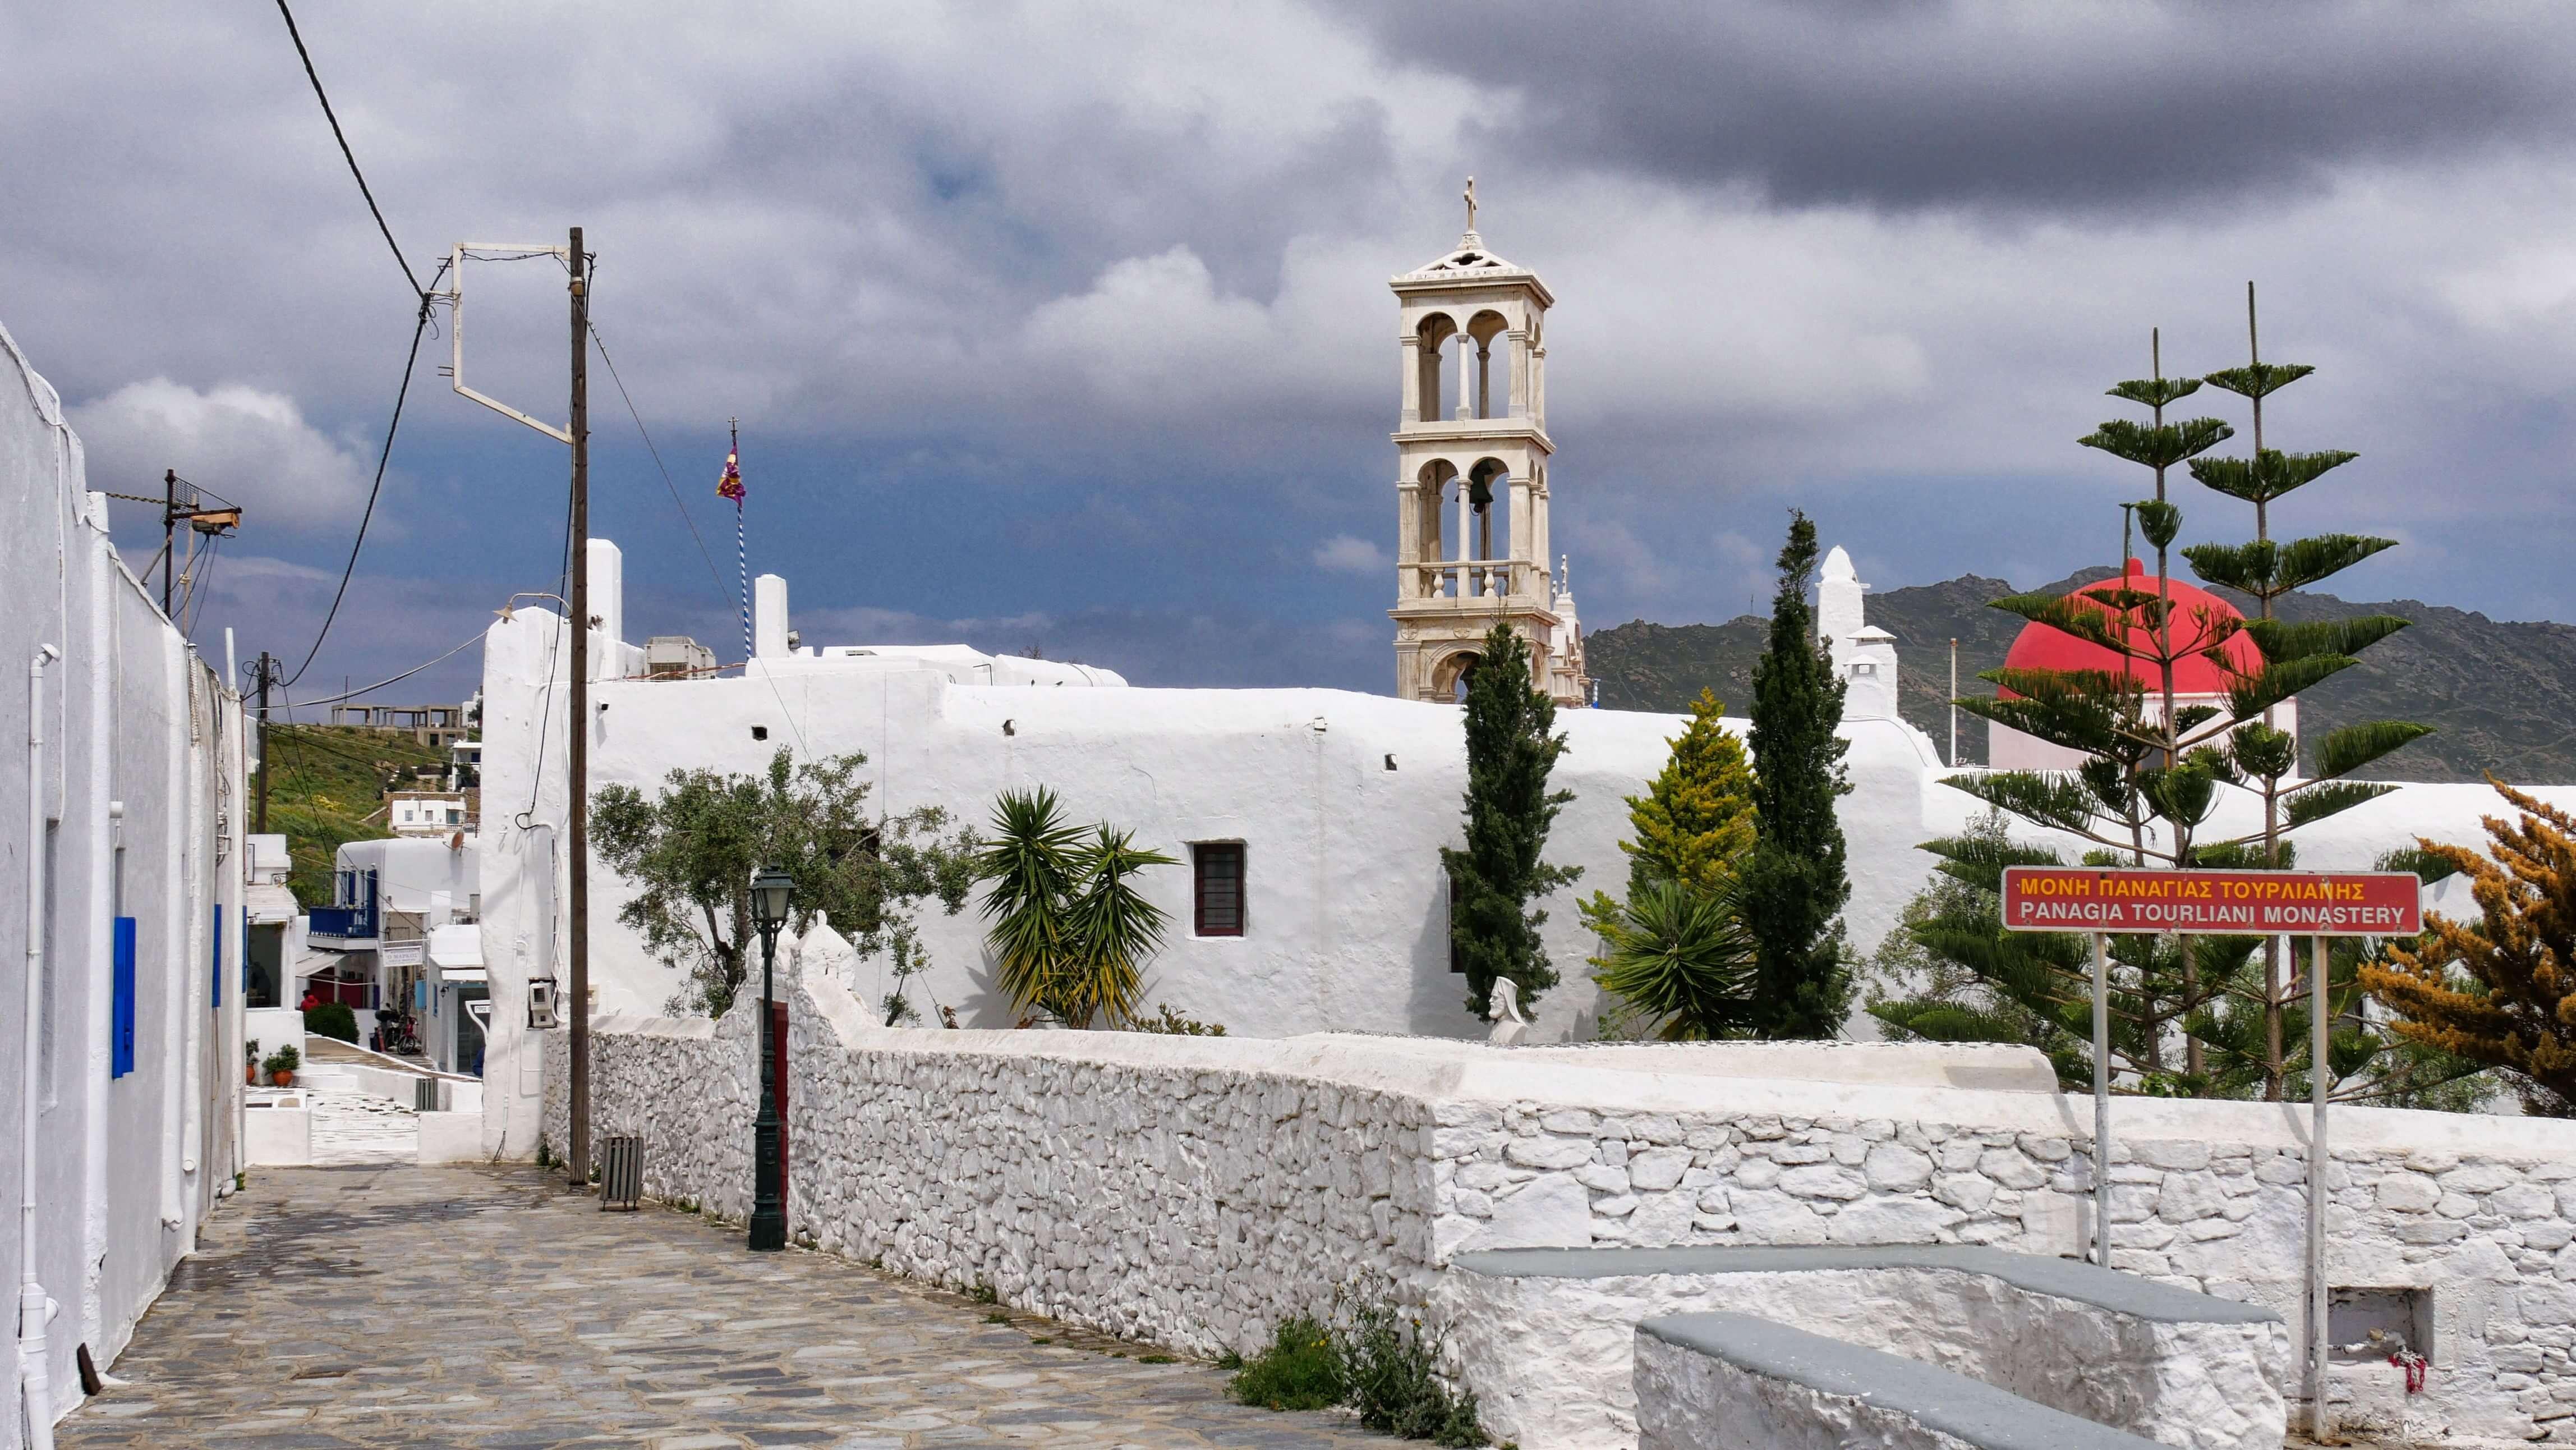 Monastère Panagia Tourliani, Ano-Mera, Mykonos, Grèce